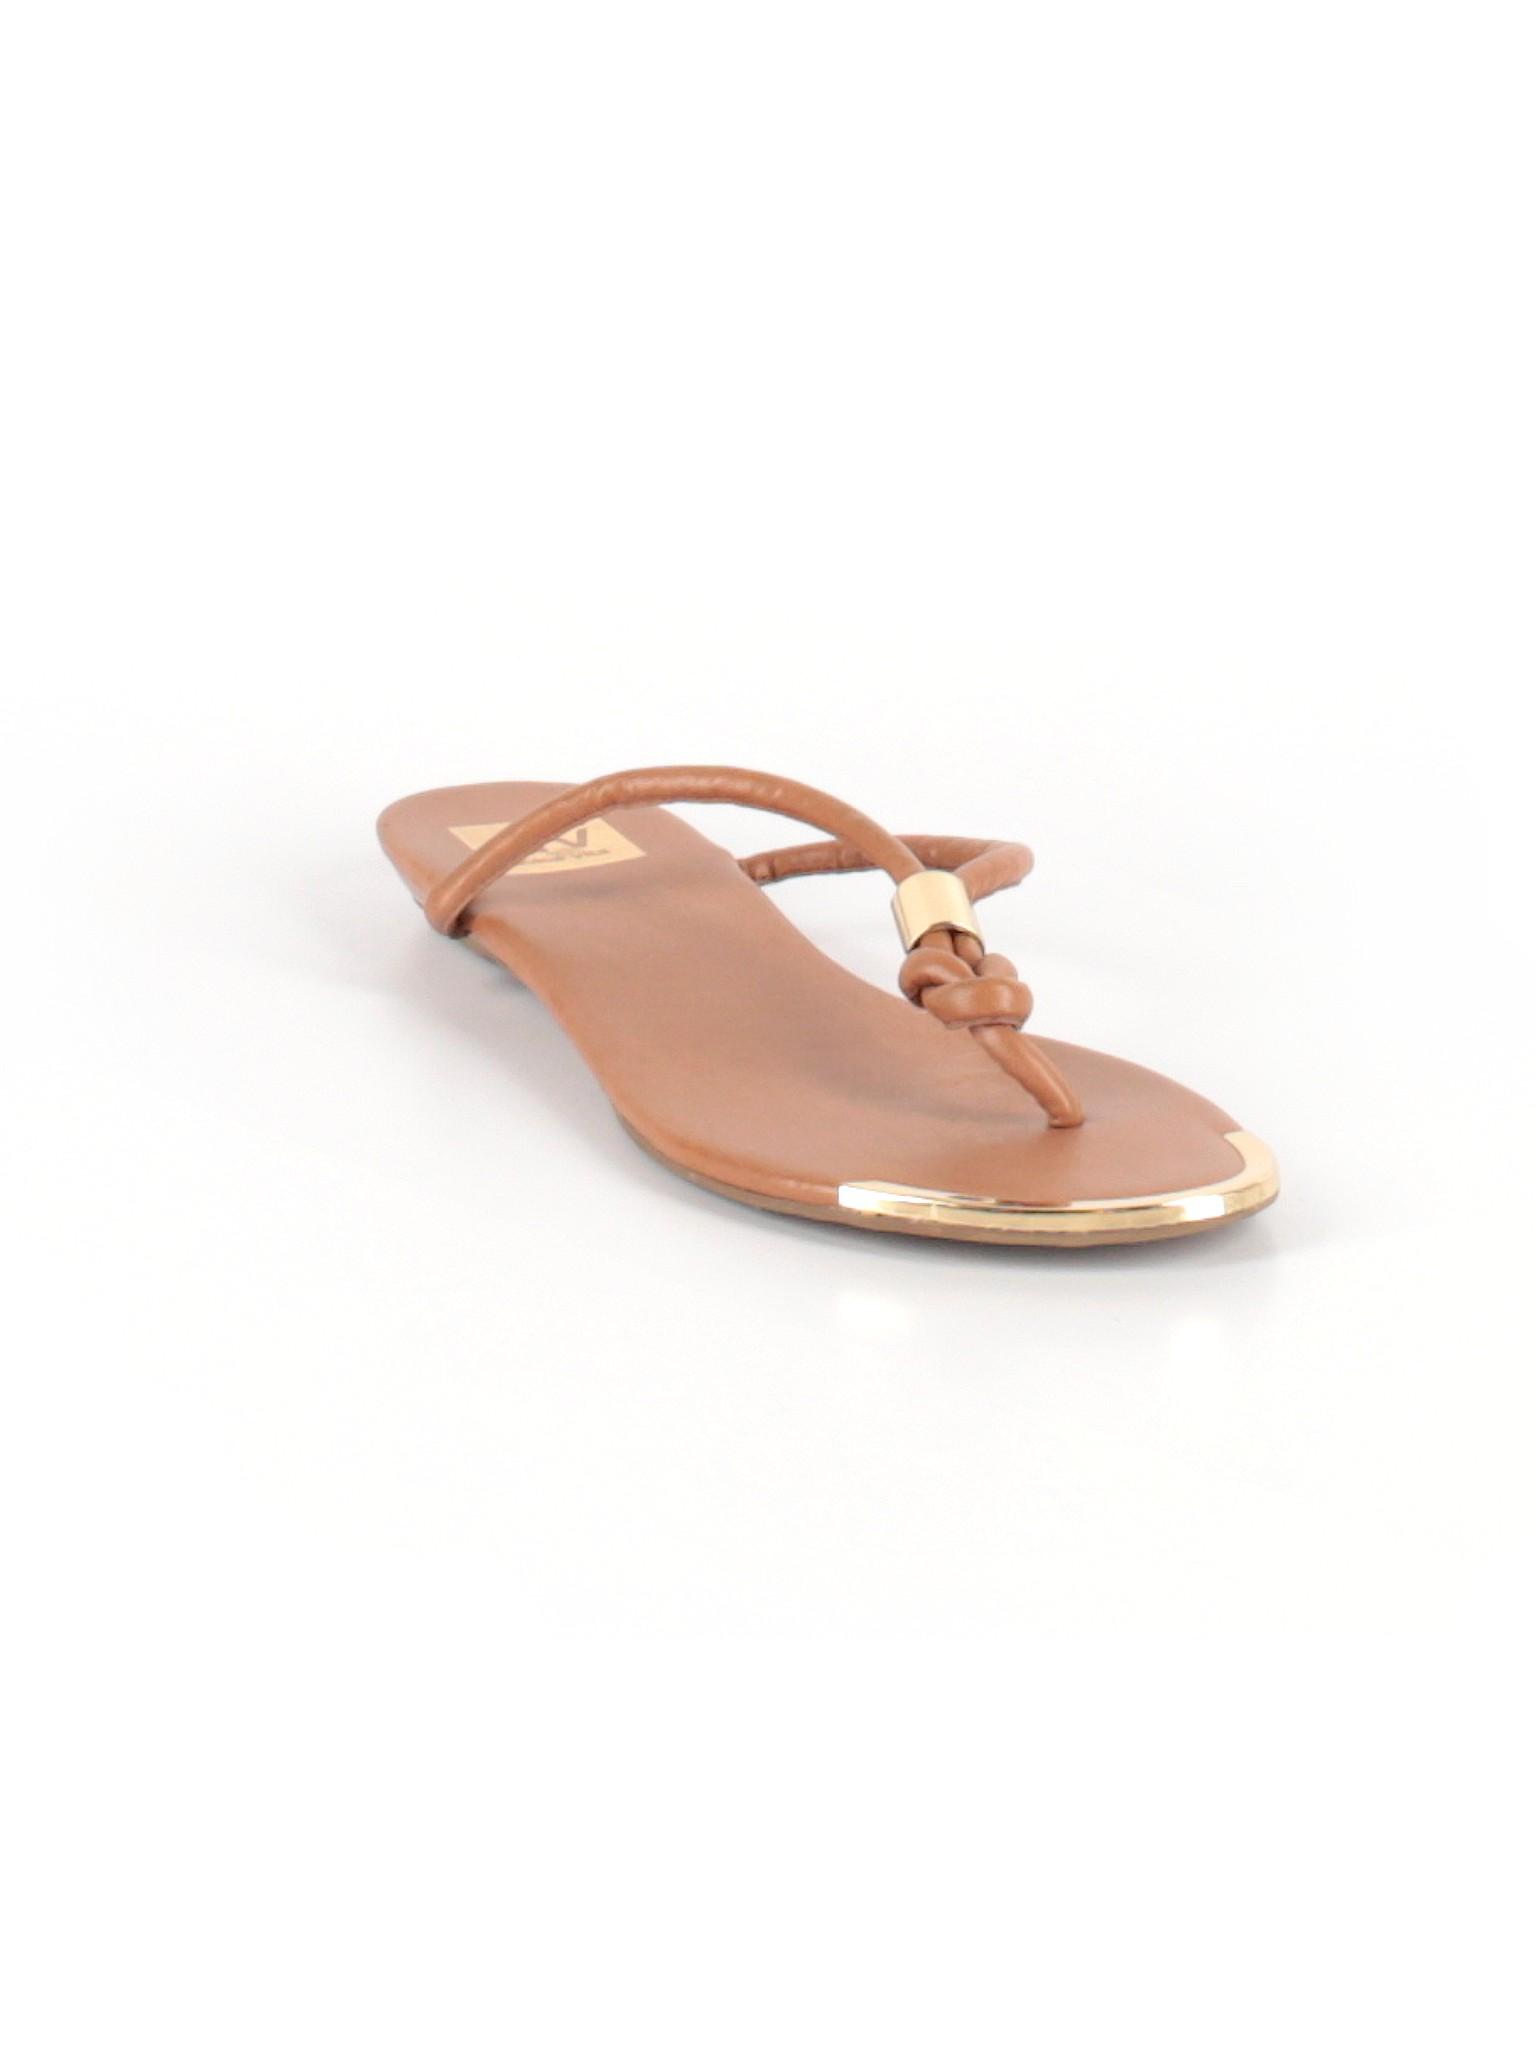 Boutique DV Sandals promotion Vita Dolce by rBrPxq